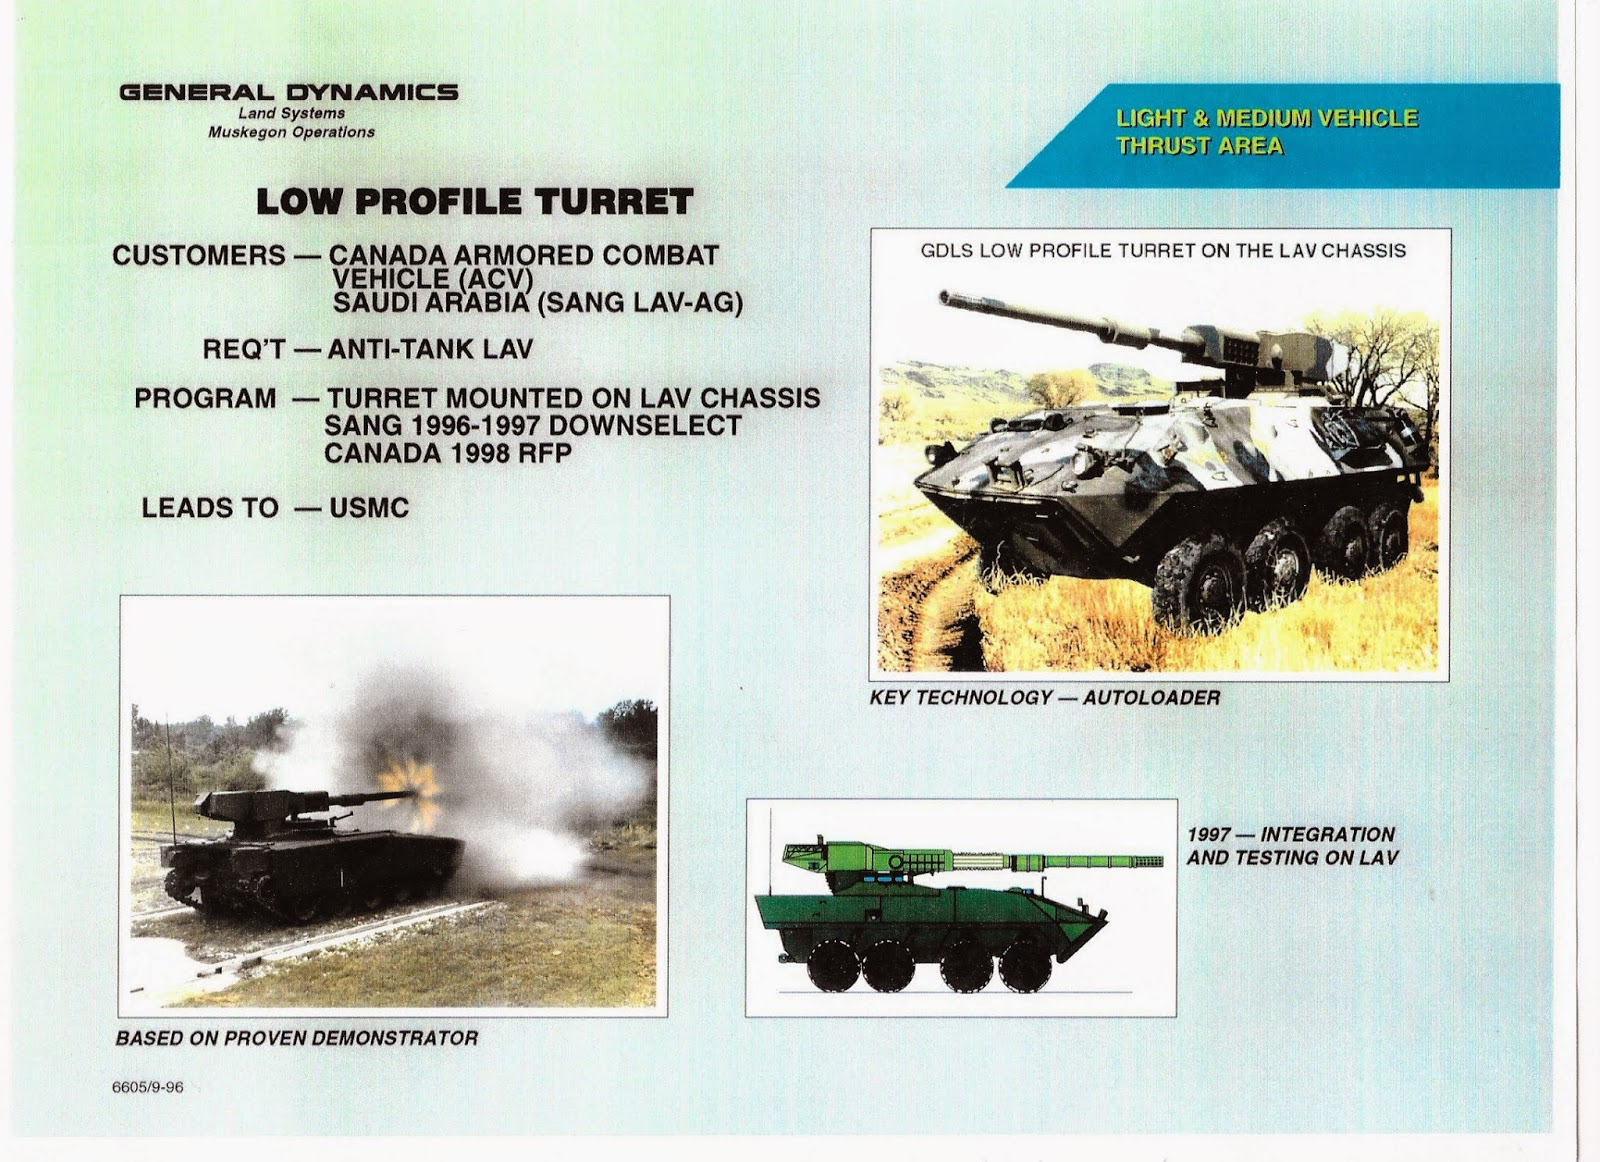 Low Profile Turret